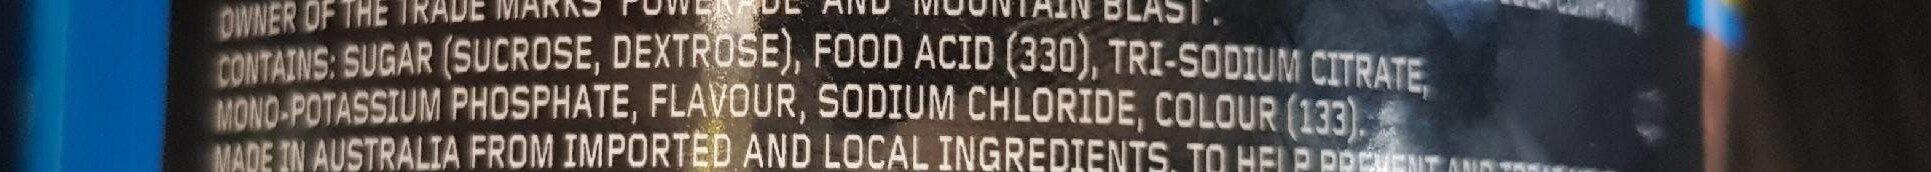 Isotonic Mountain Blast Powder - Ingrédients - fr